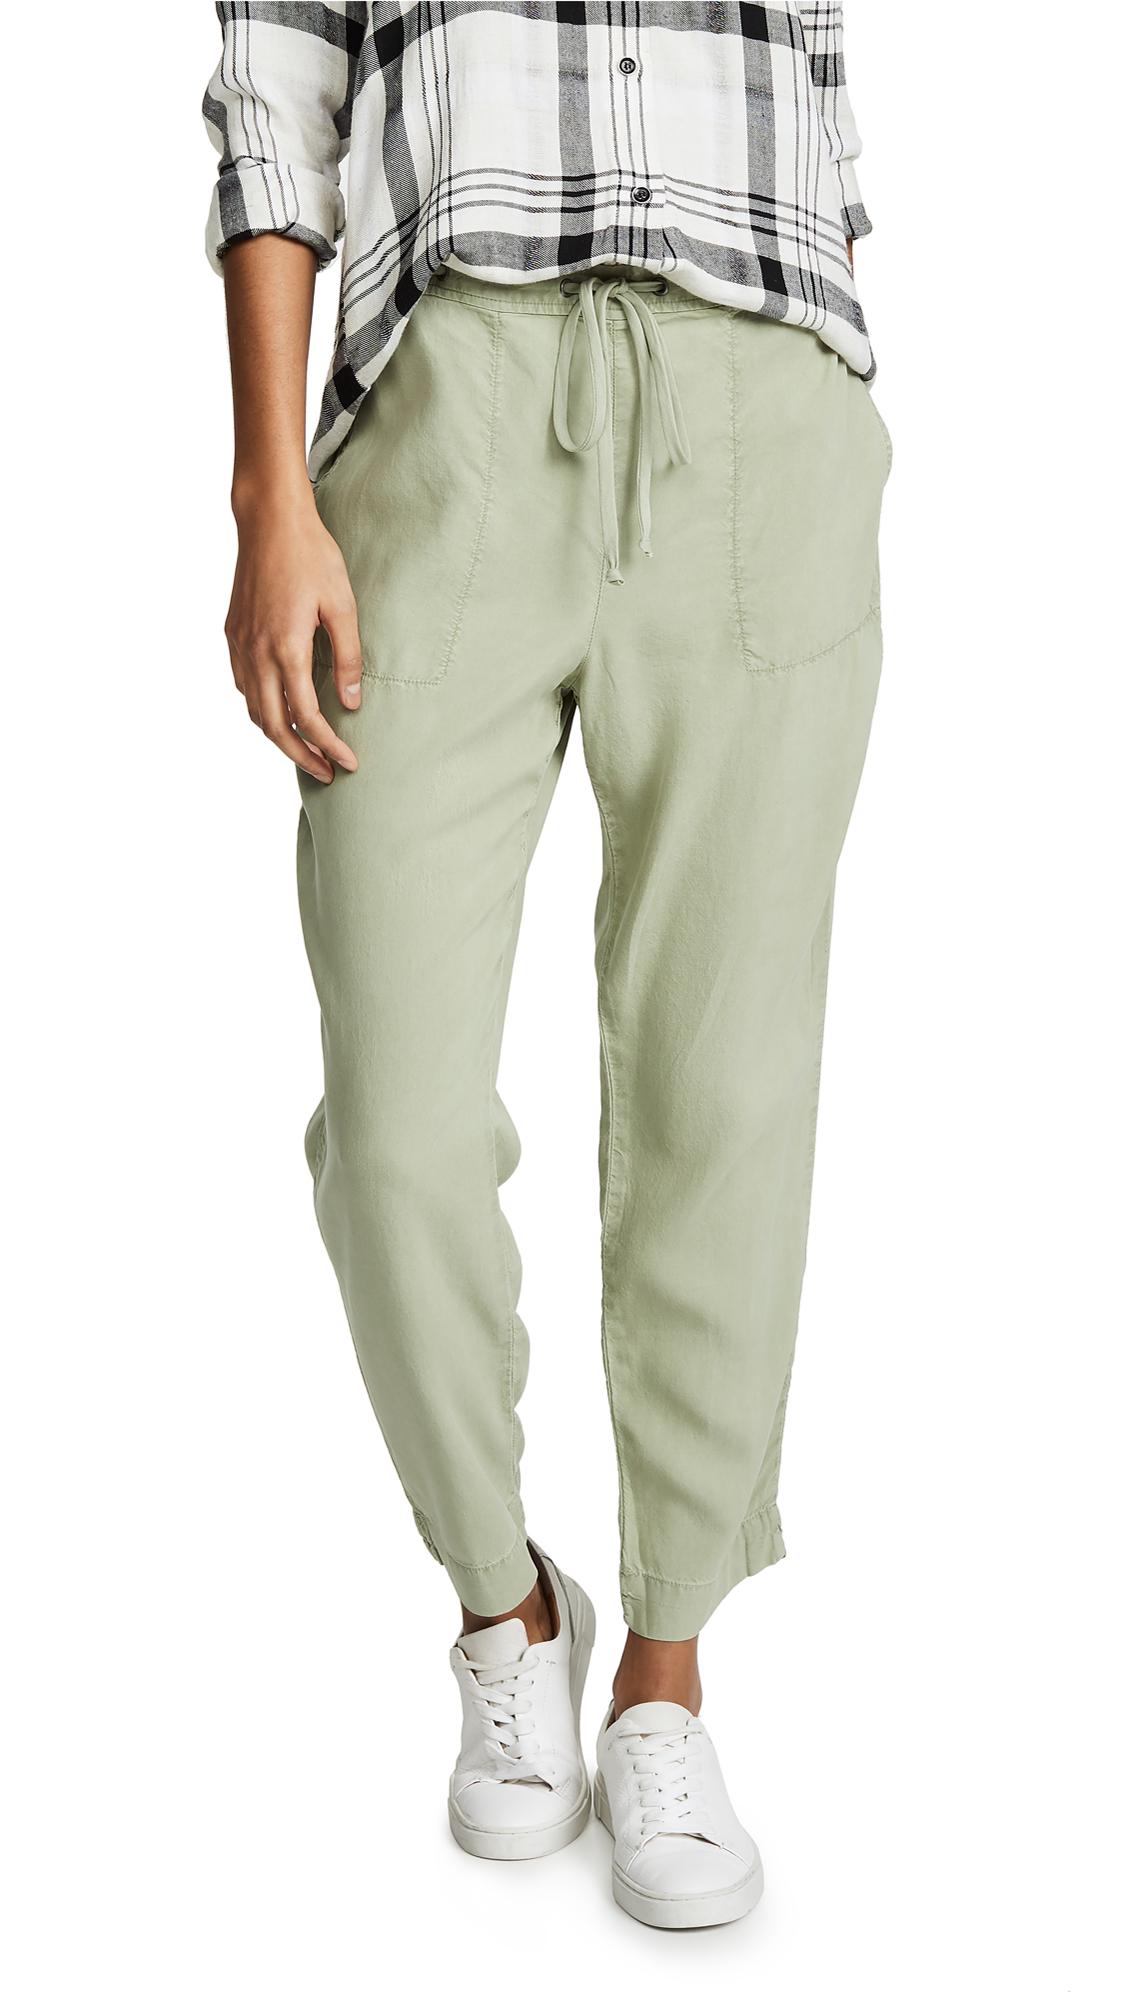 Bella Dahl Grommet Trousers